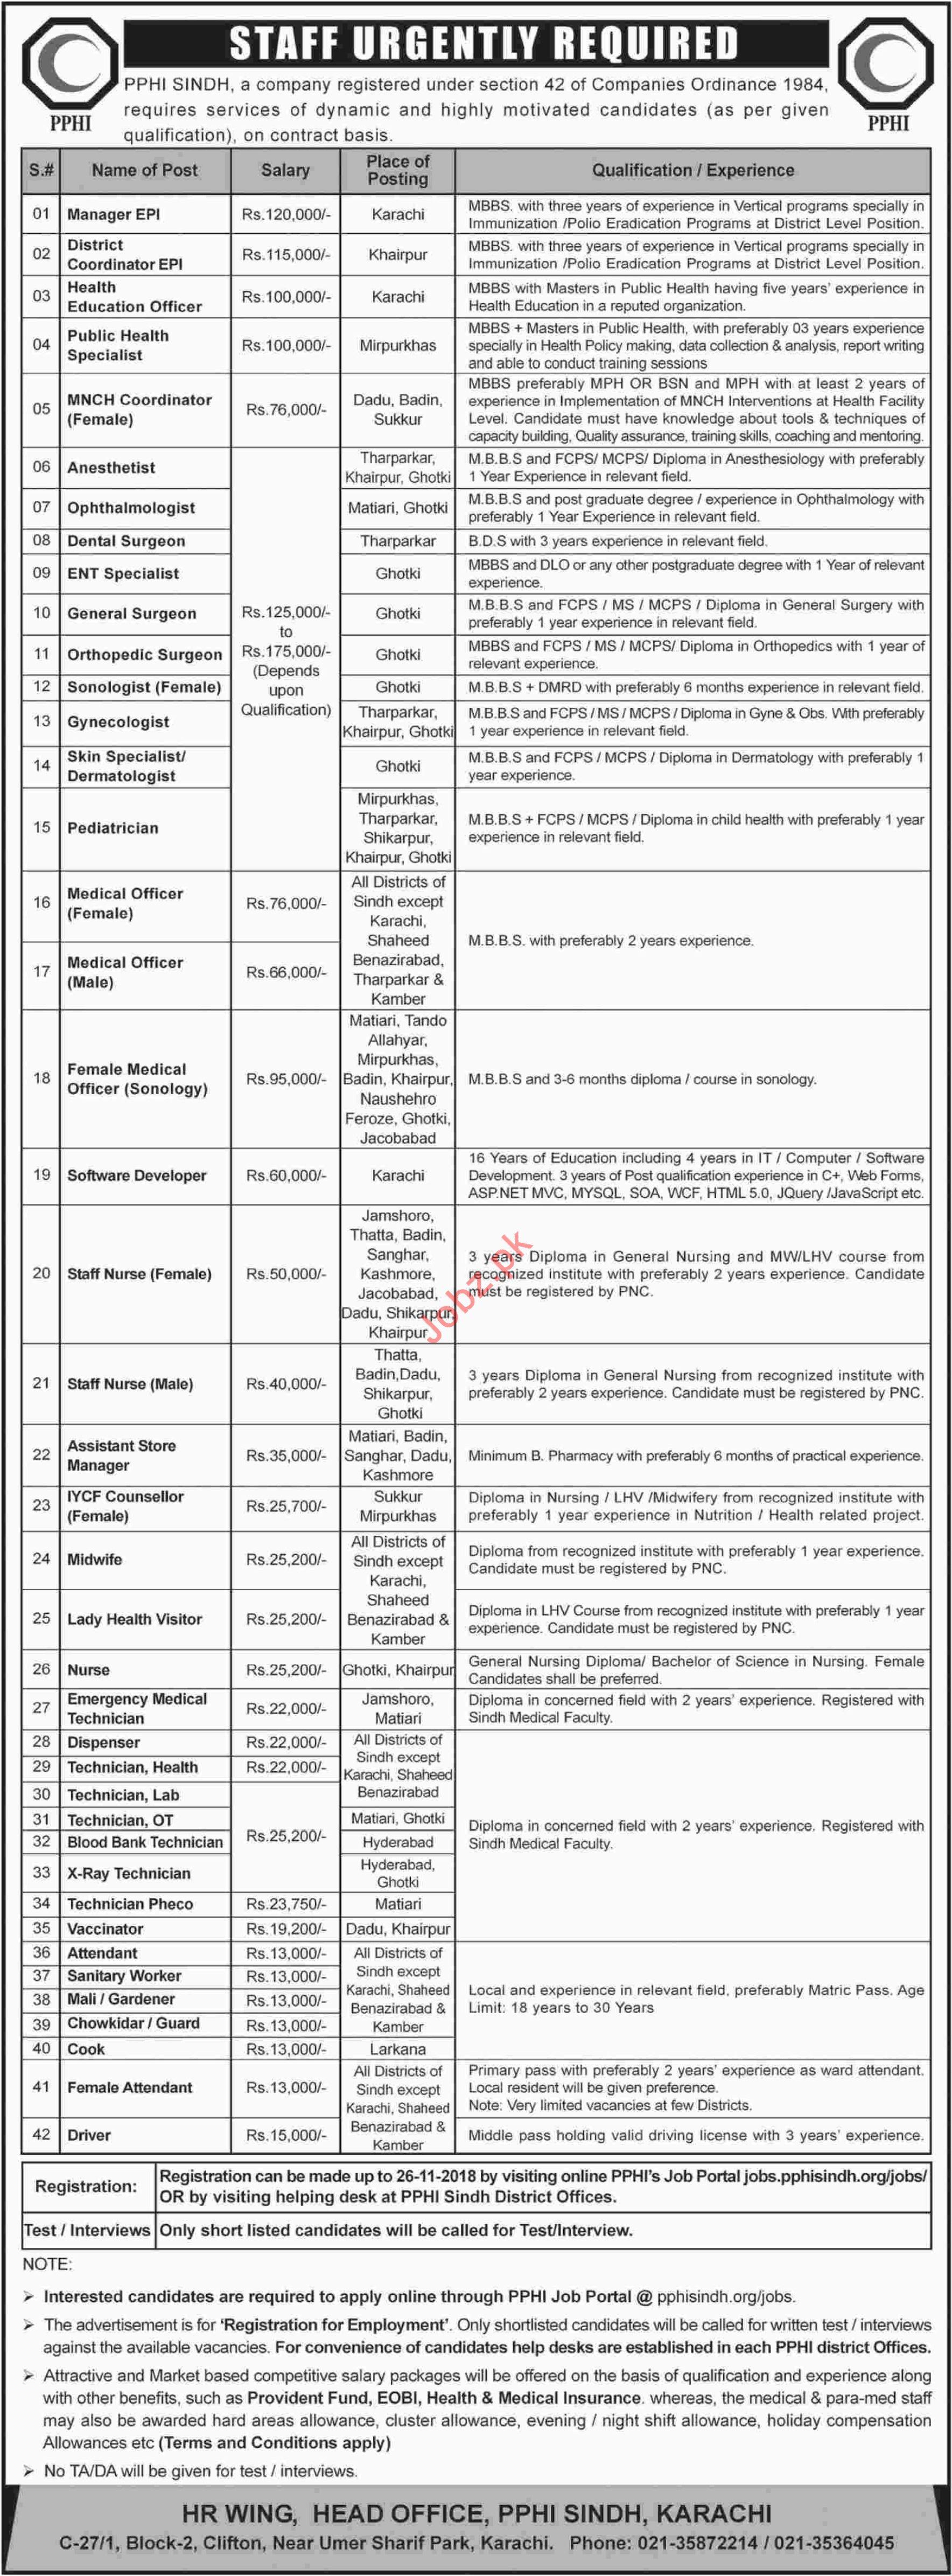 PPHI Sindh Jobs 2018 for Medical Officers, Surgeons & Nurses